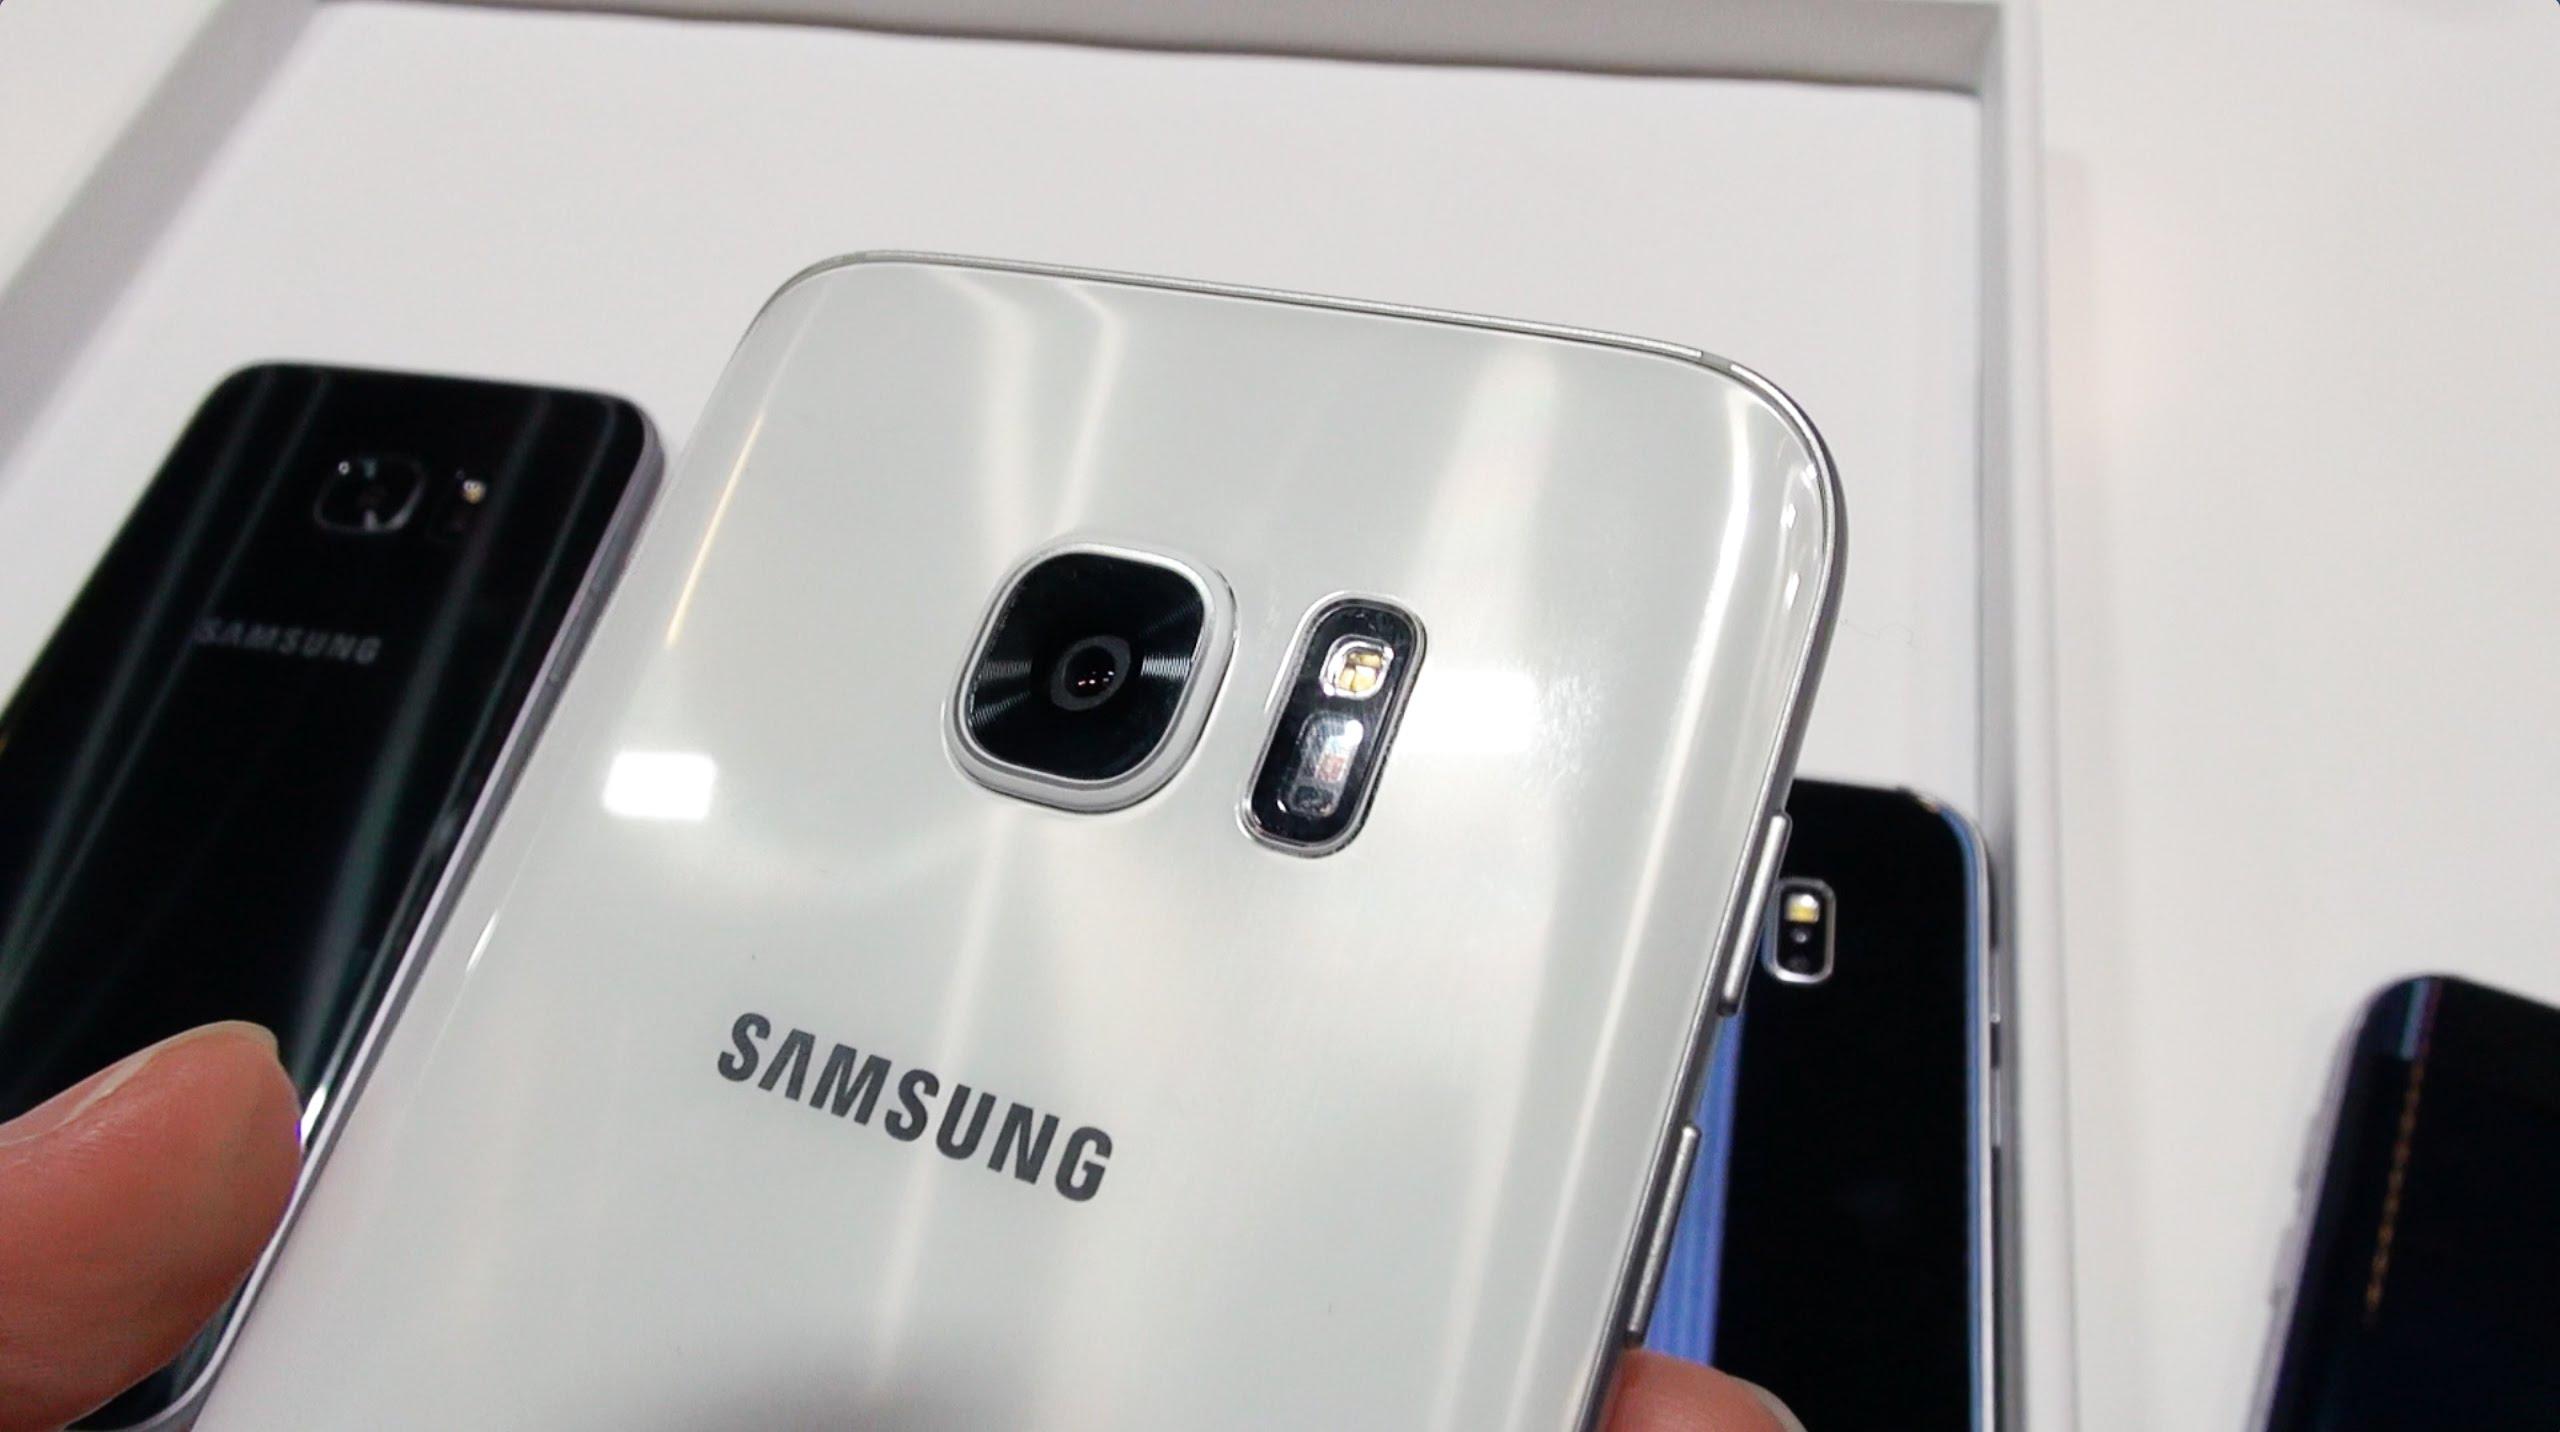 Samsung Galaxy S7 & S7 Edge: In-Depth Hands On / Walkthrough